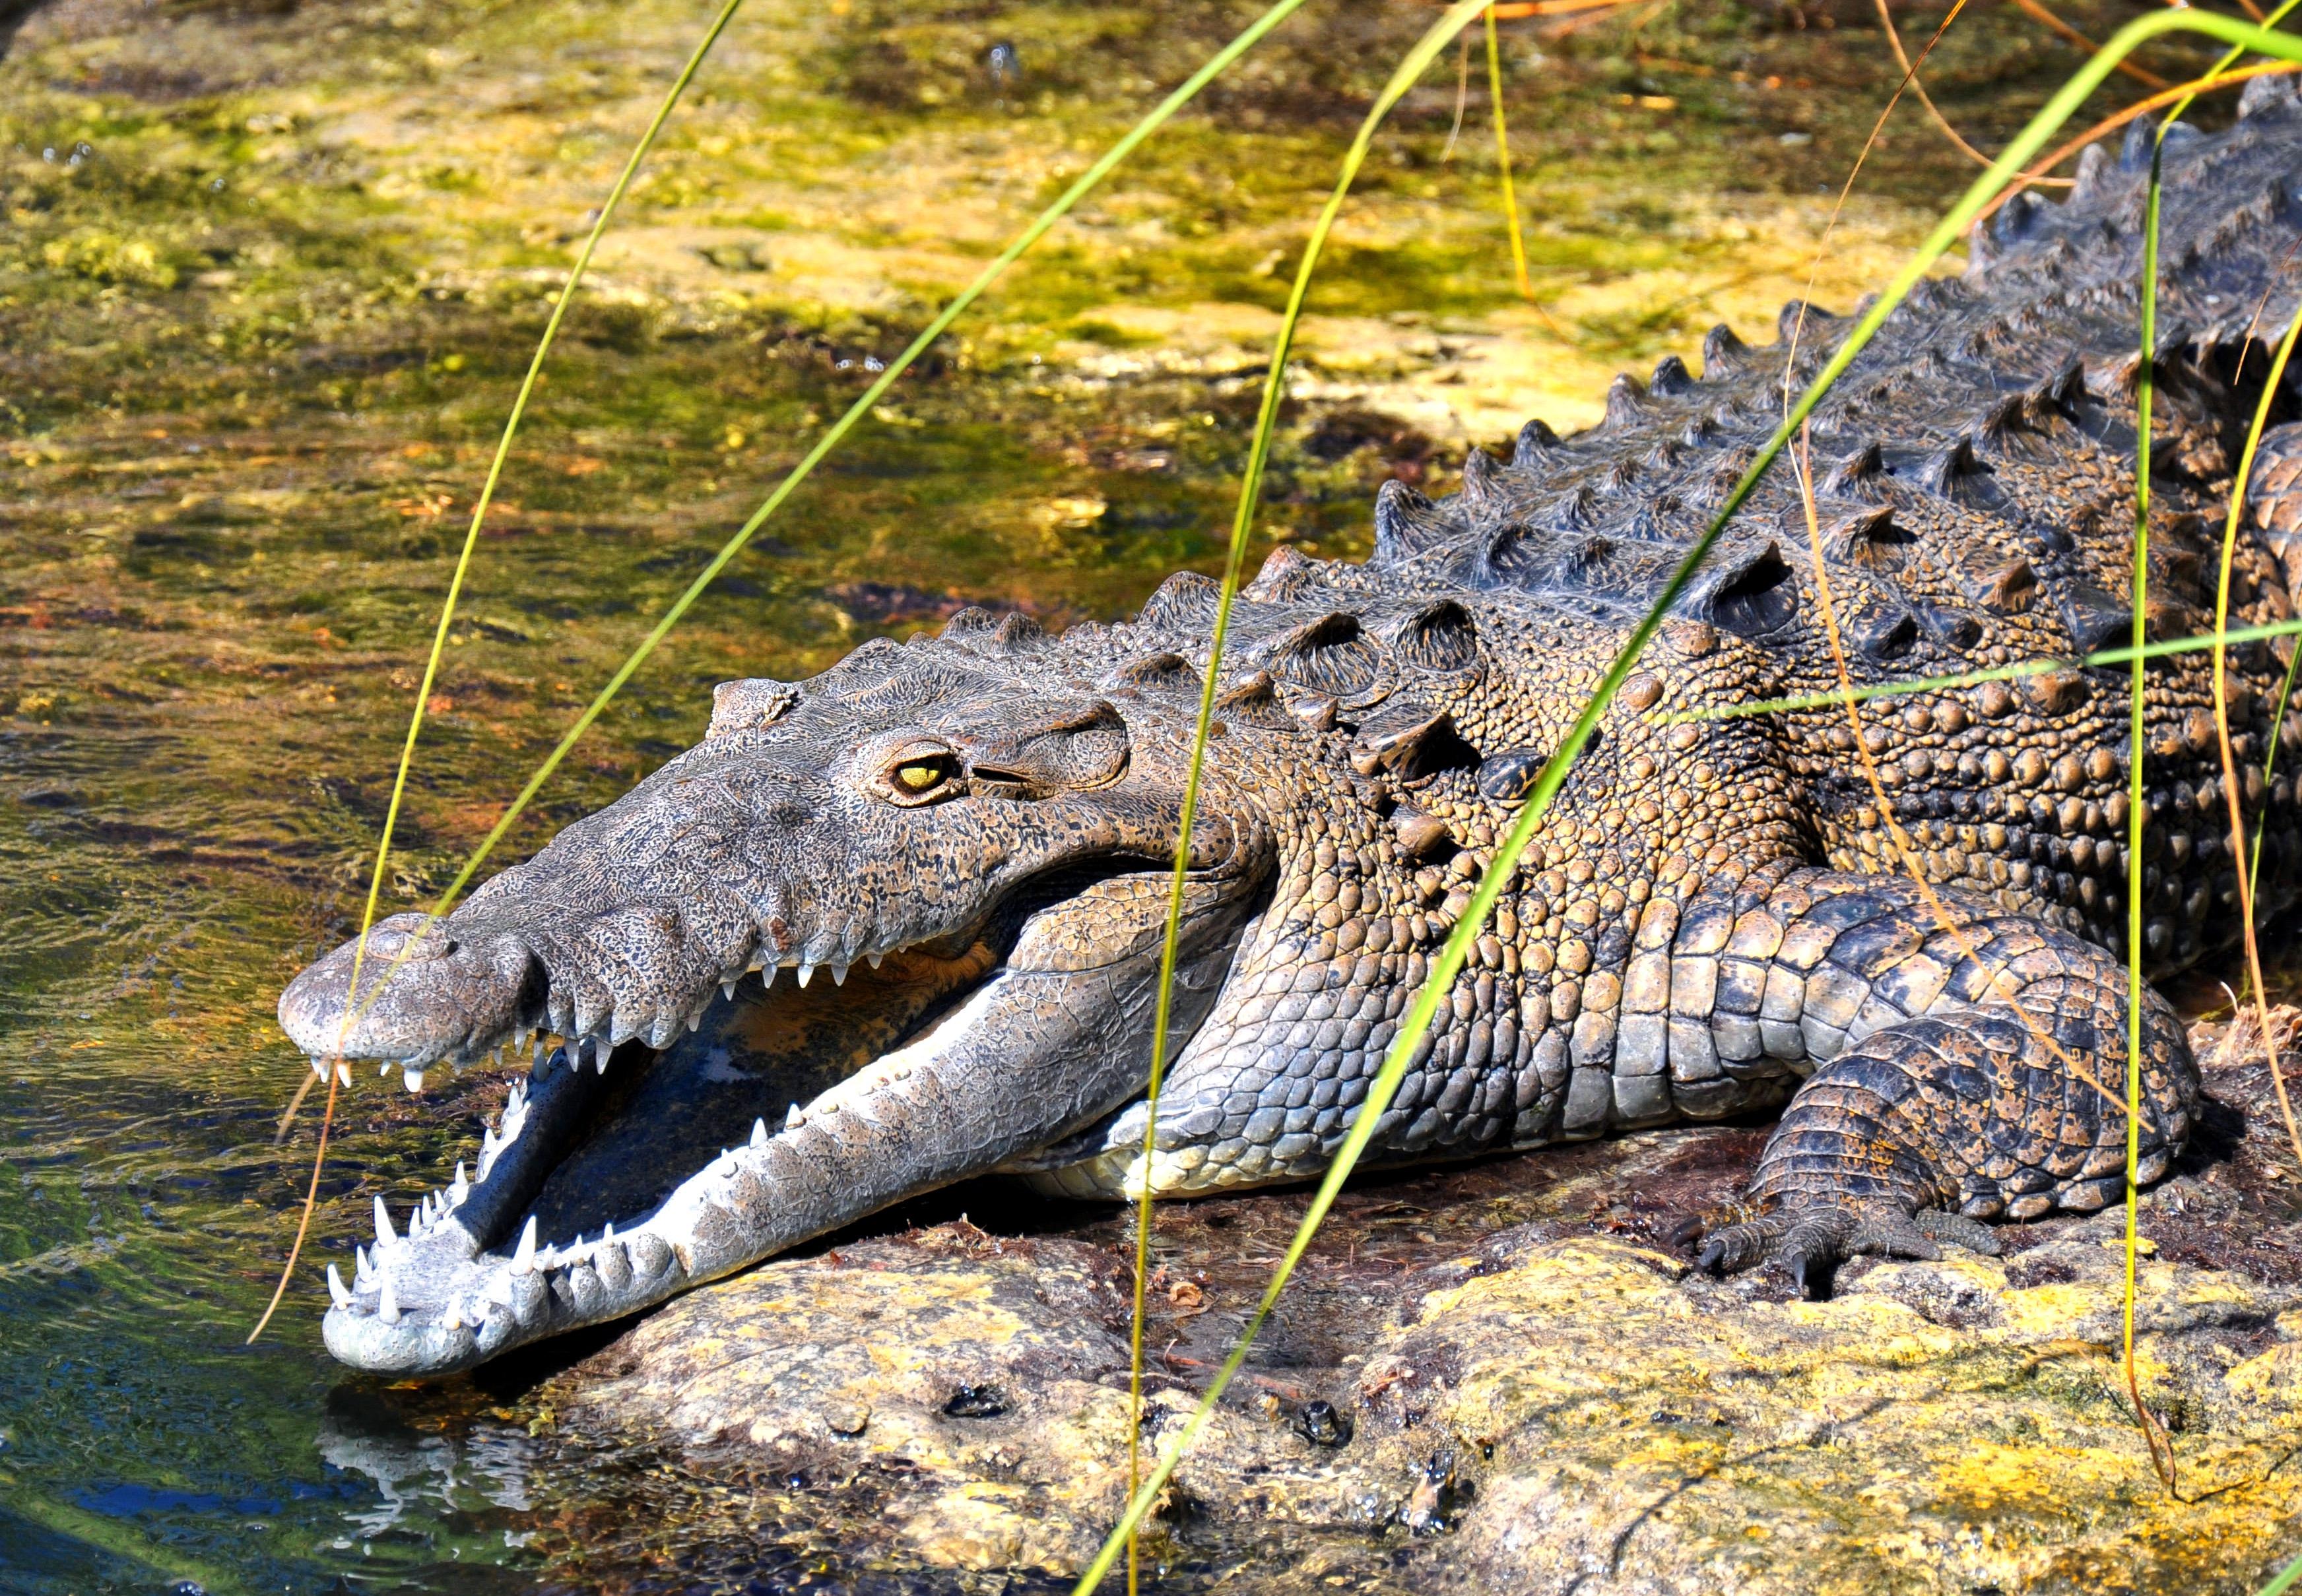 a study of the american crocodile